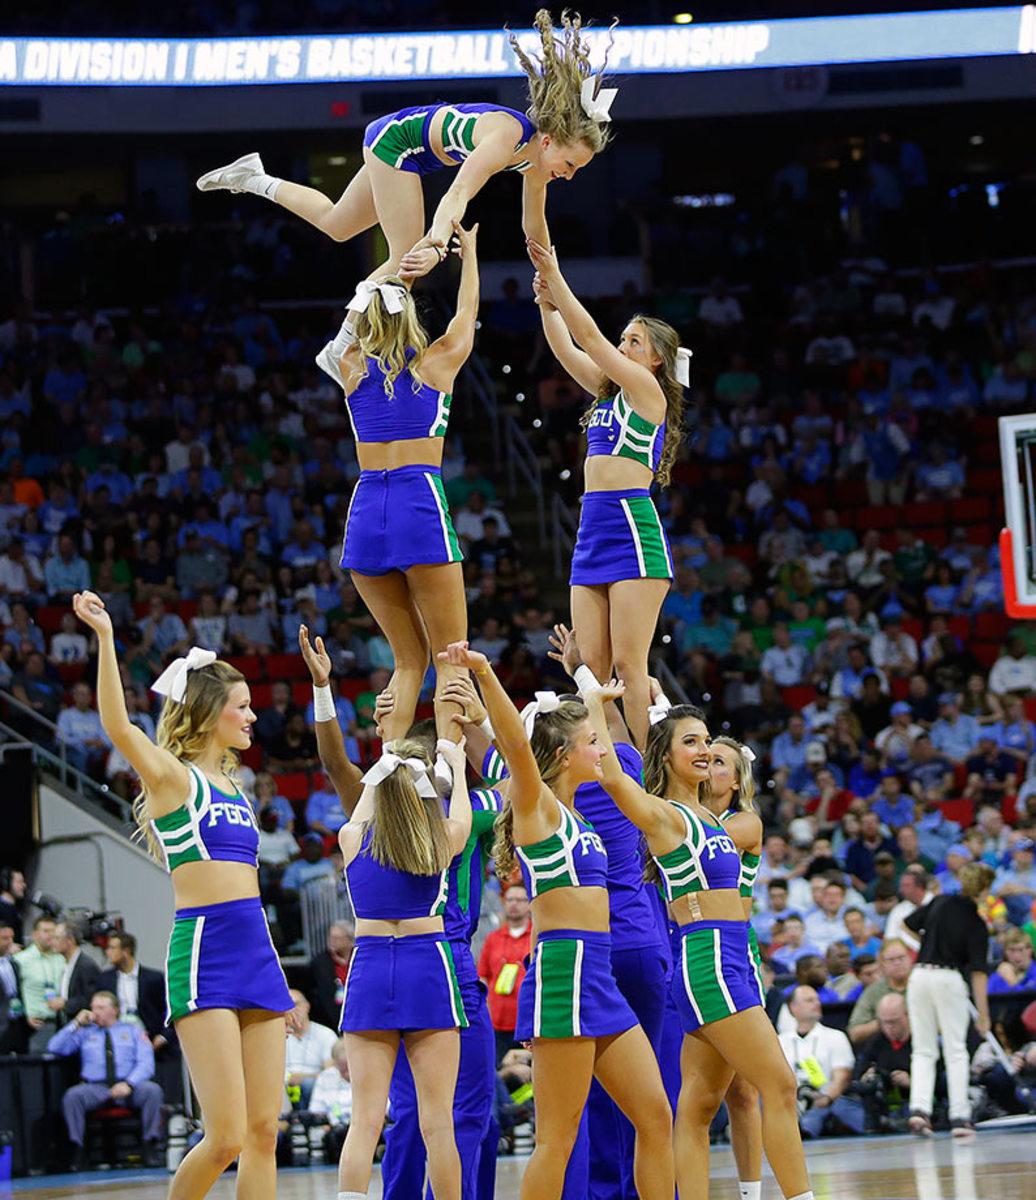 Florida-Gulf-Coast-cheerleaders-f9d643e4d730423fa7b996dd5d75f6e5-0.jpg